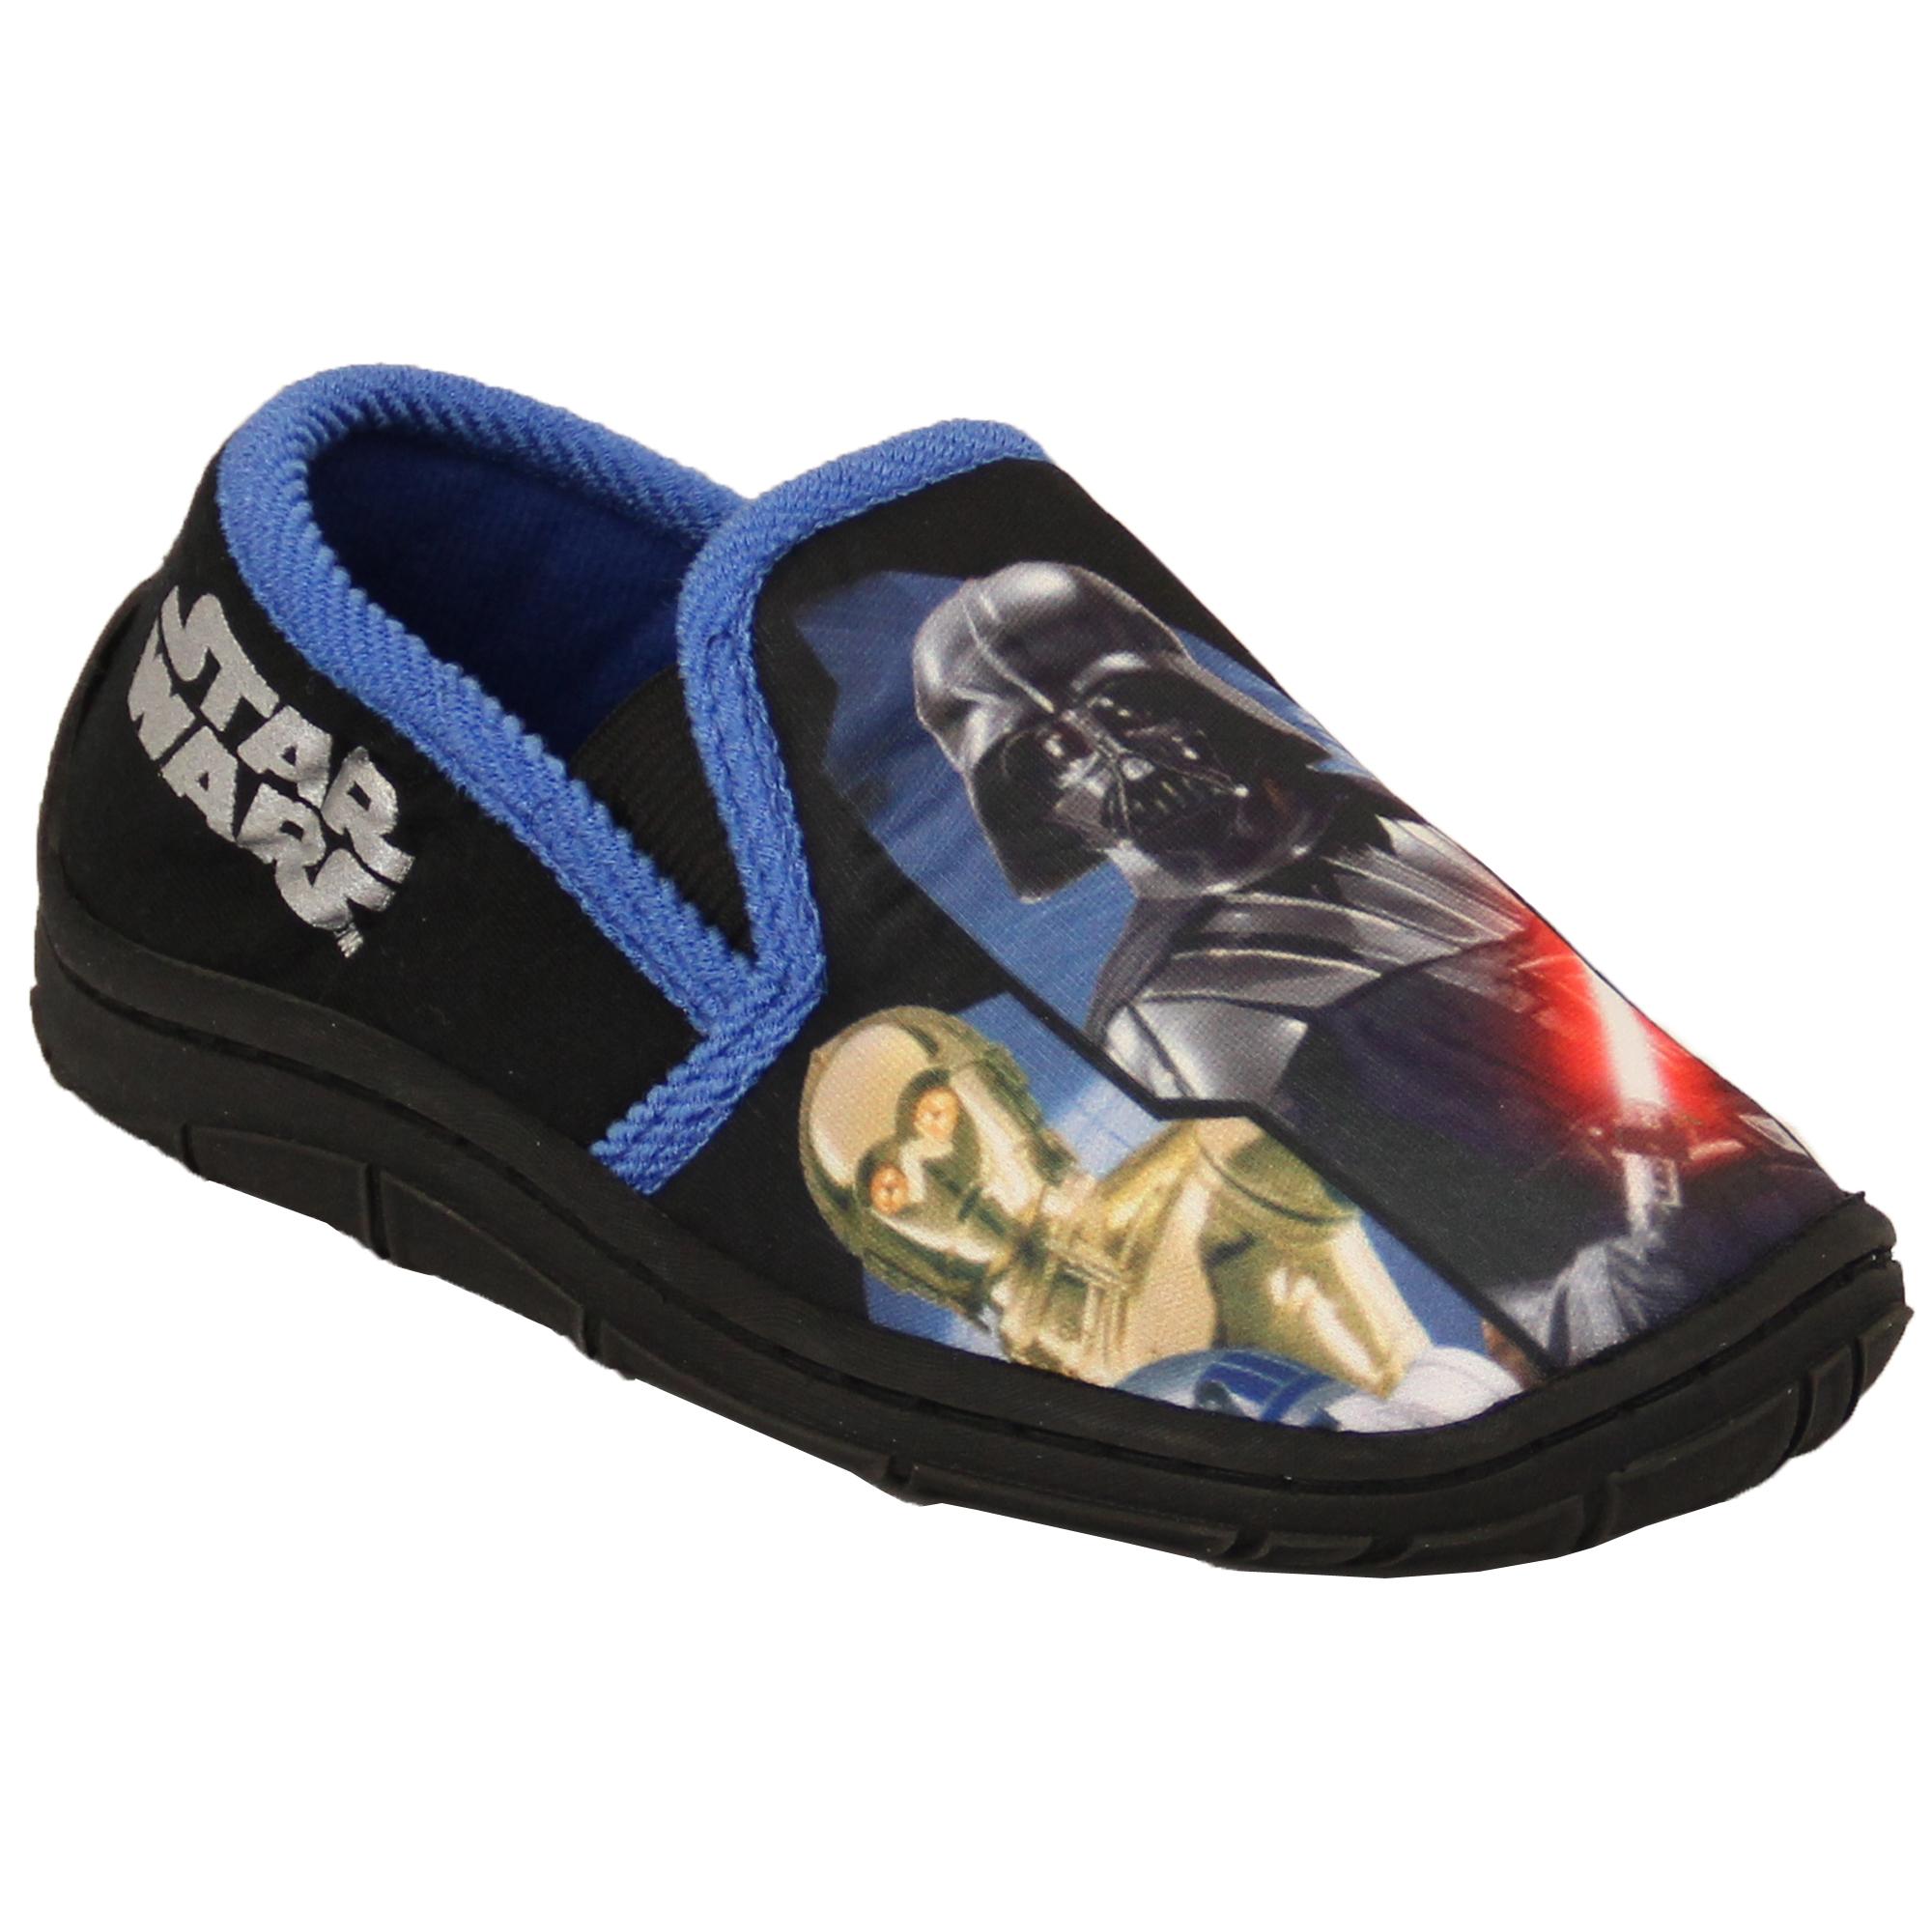 Boys-Girls-Shoes-Minion-Kids-Trainers-Star-Wars-Disney-Spiderman-Slipper thumbnail 10